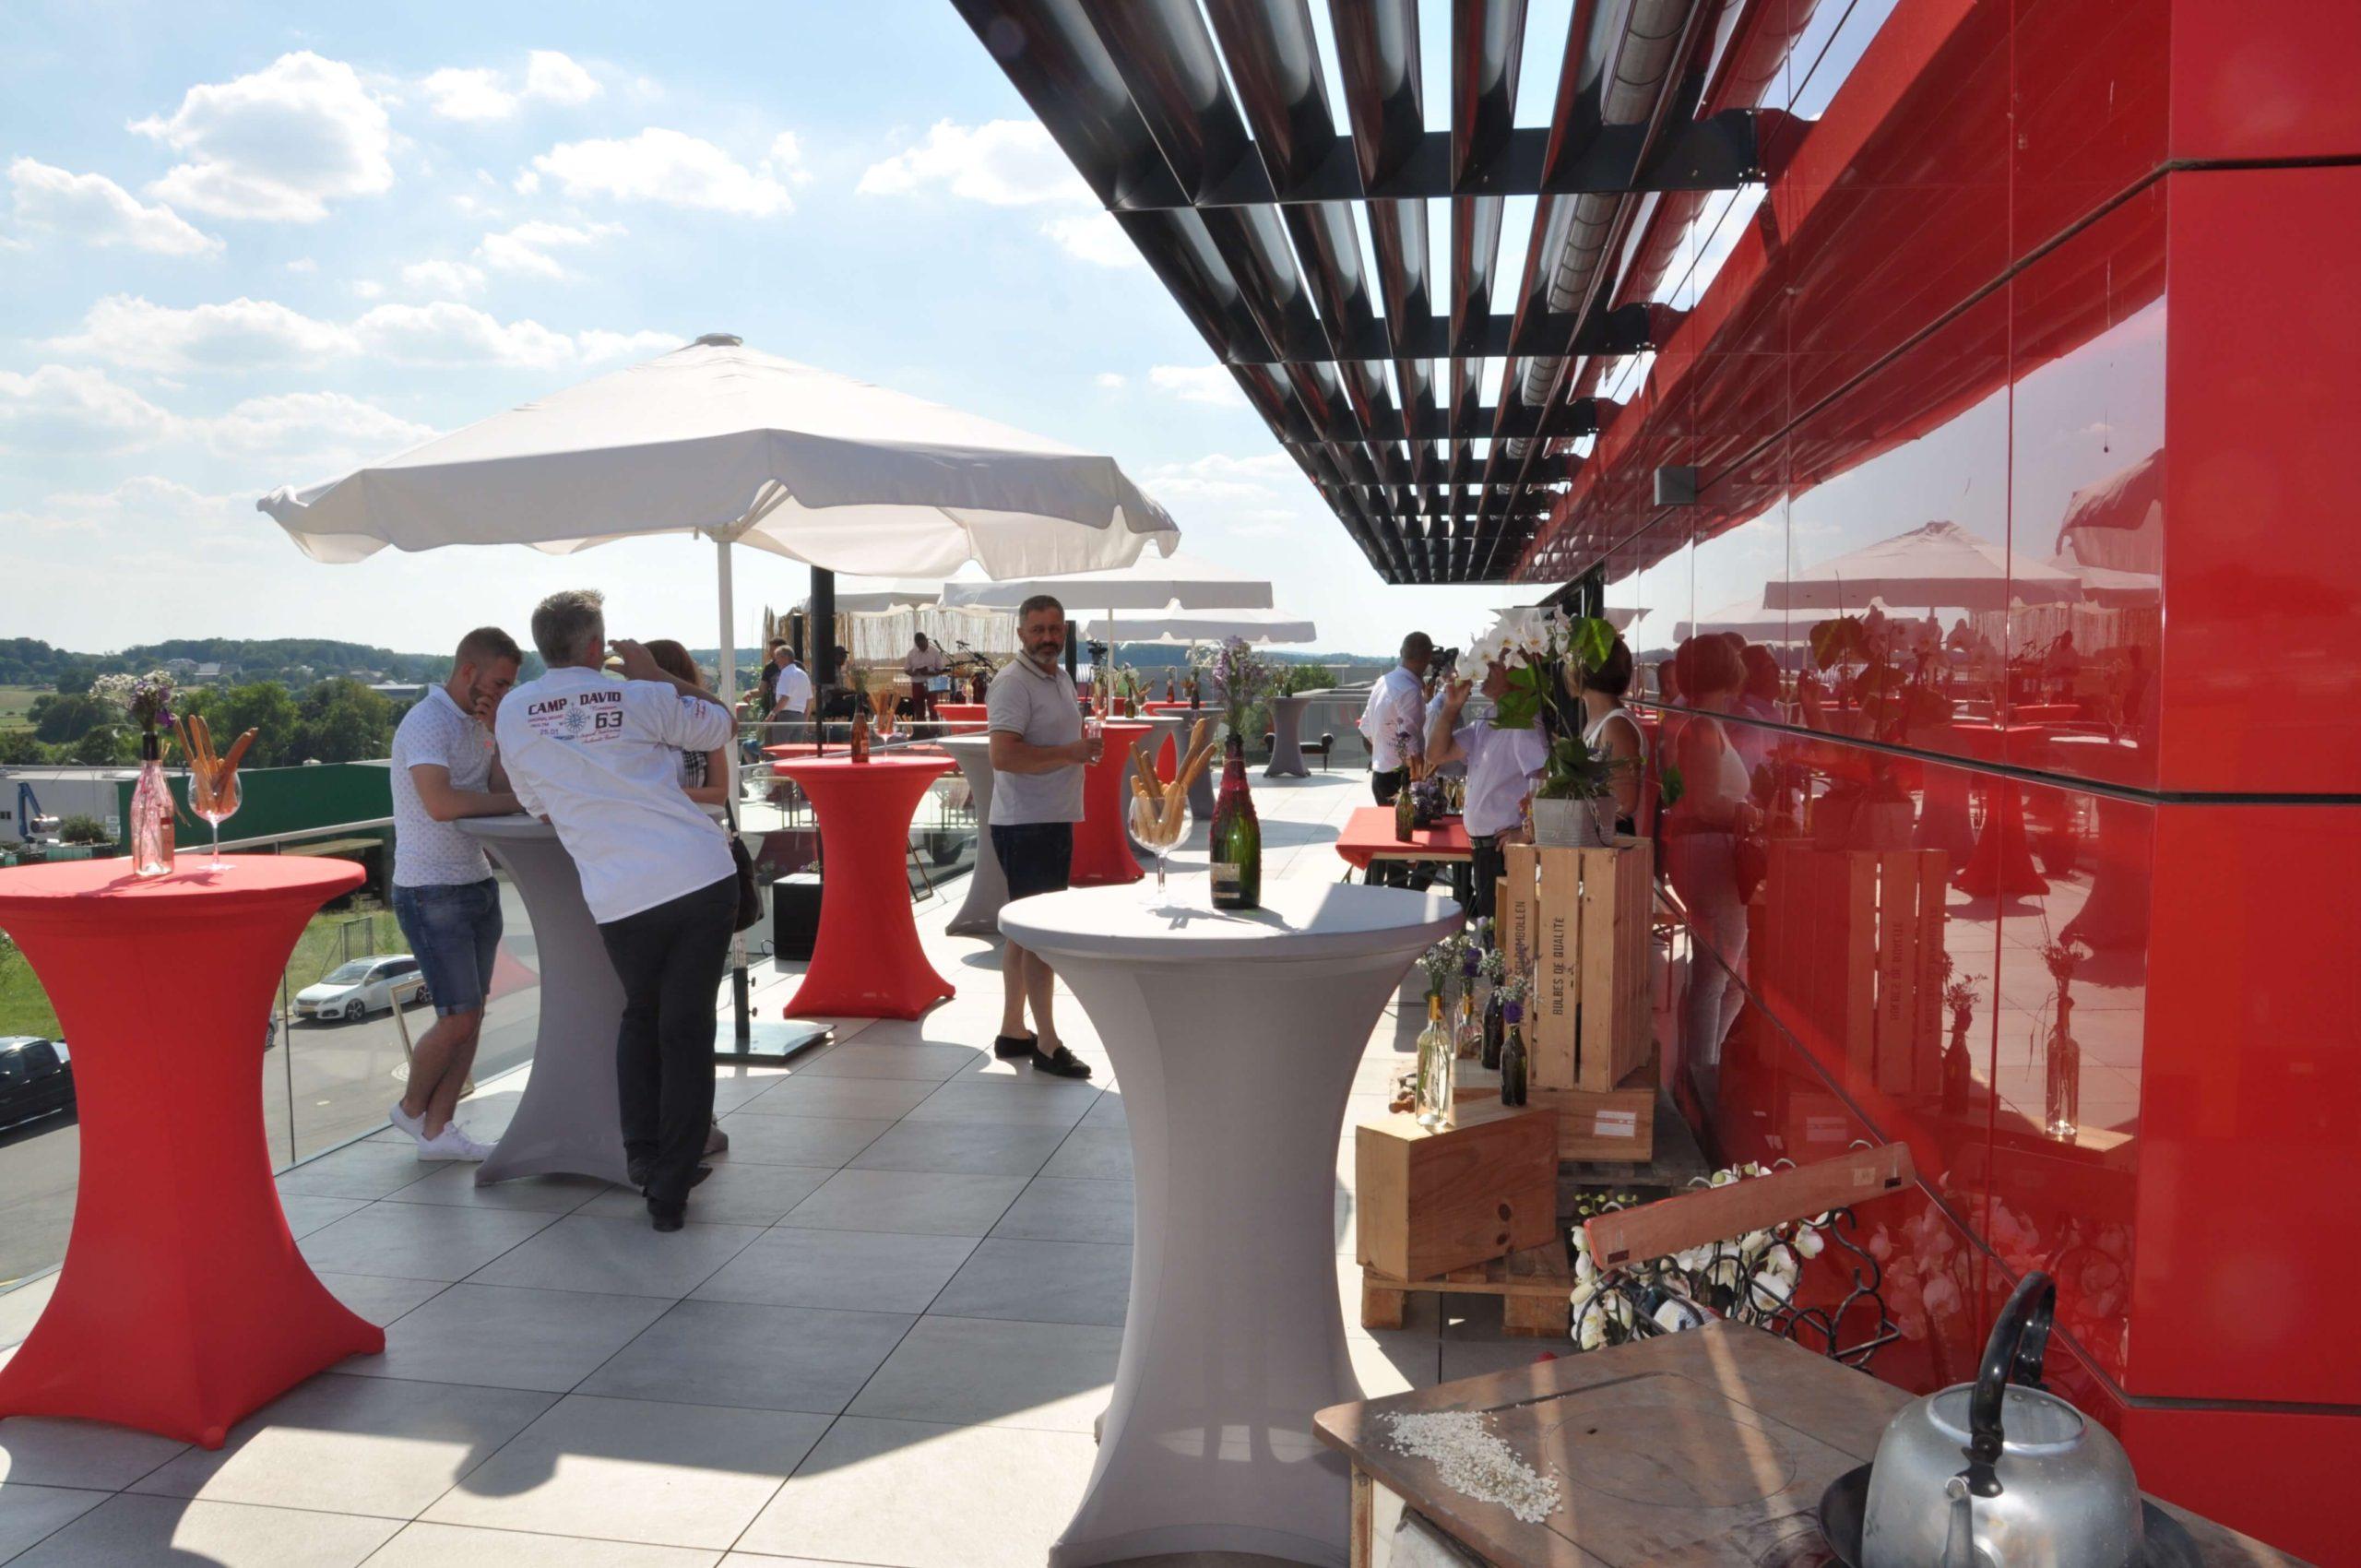 Reperes_GroupeMarechal-event_roof top